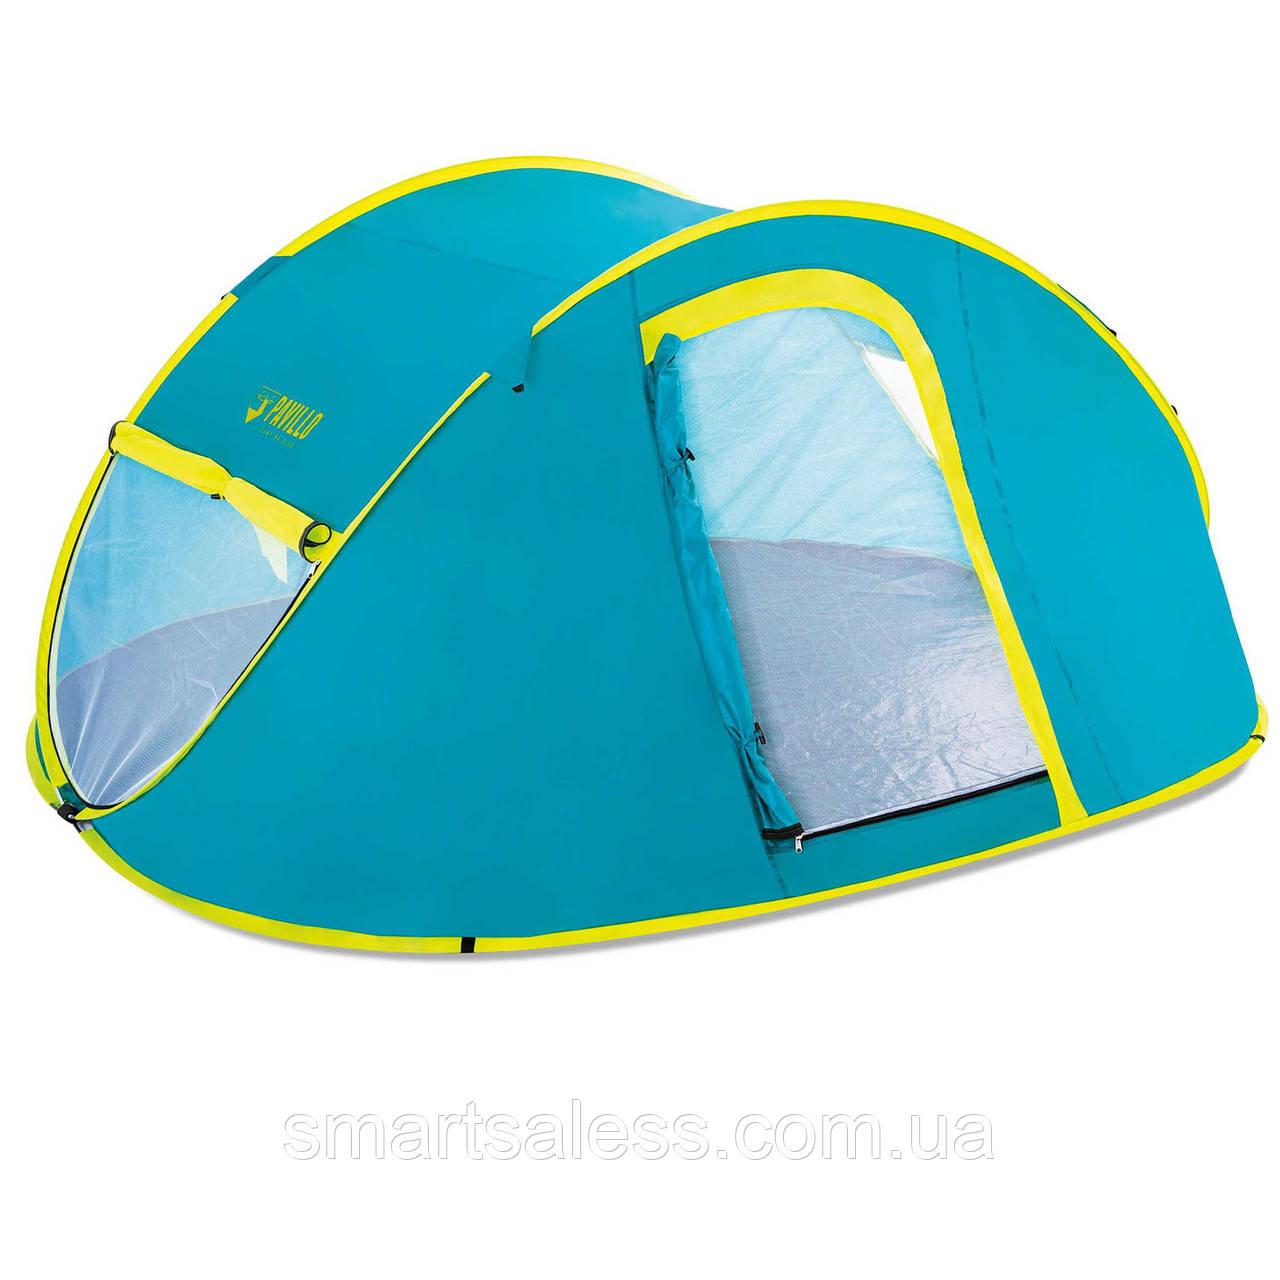 Четырехместная палатка Pavillo Bestway 68087 «Cool Mount 4», 240 х 210 х 100 см